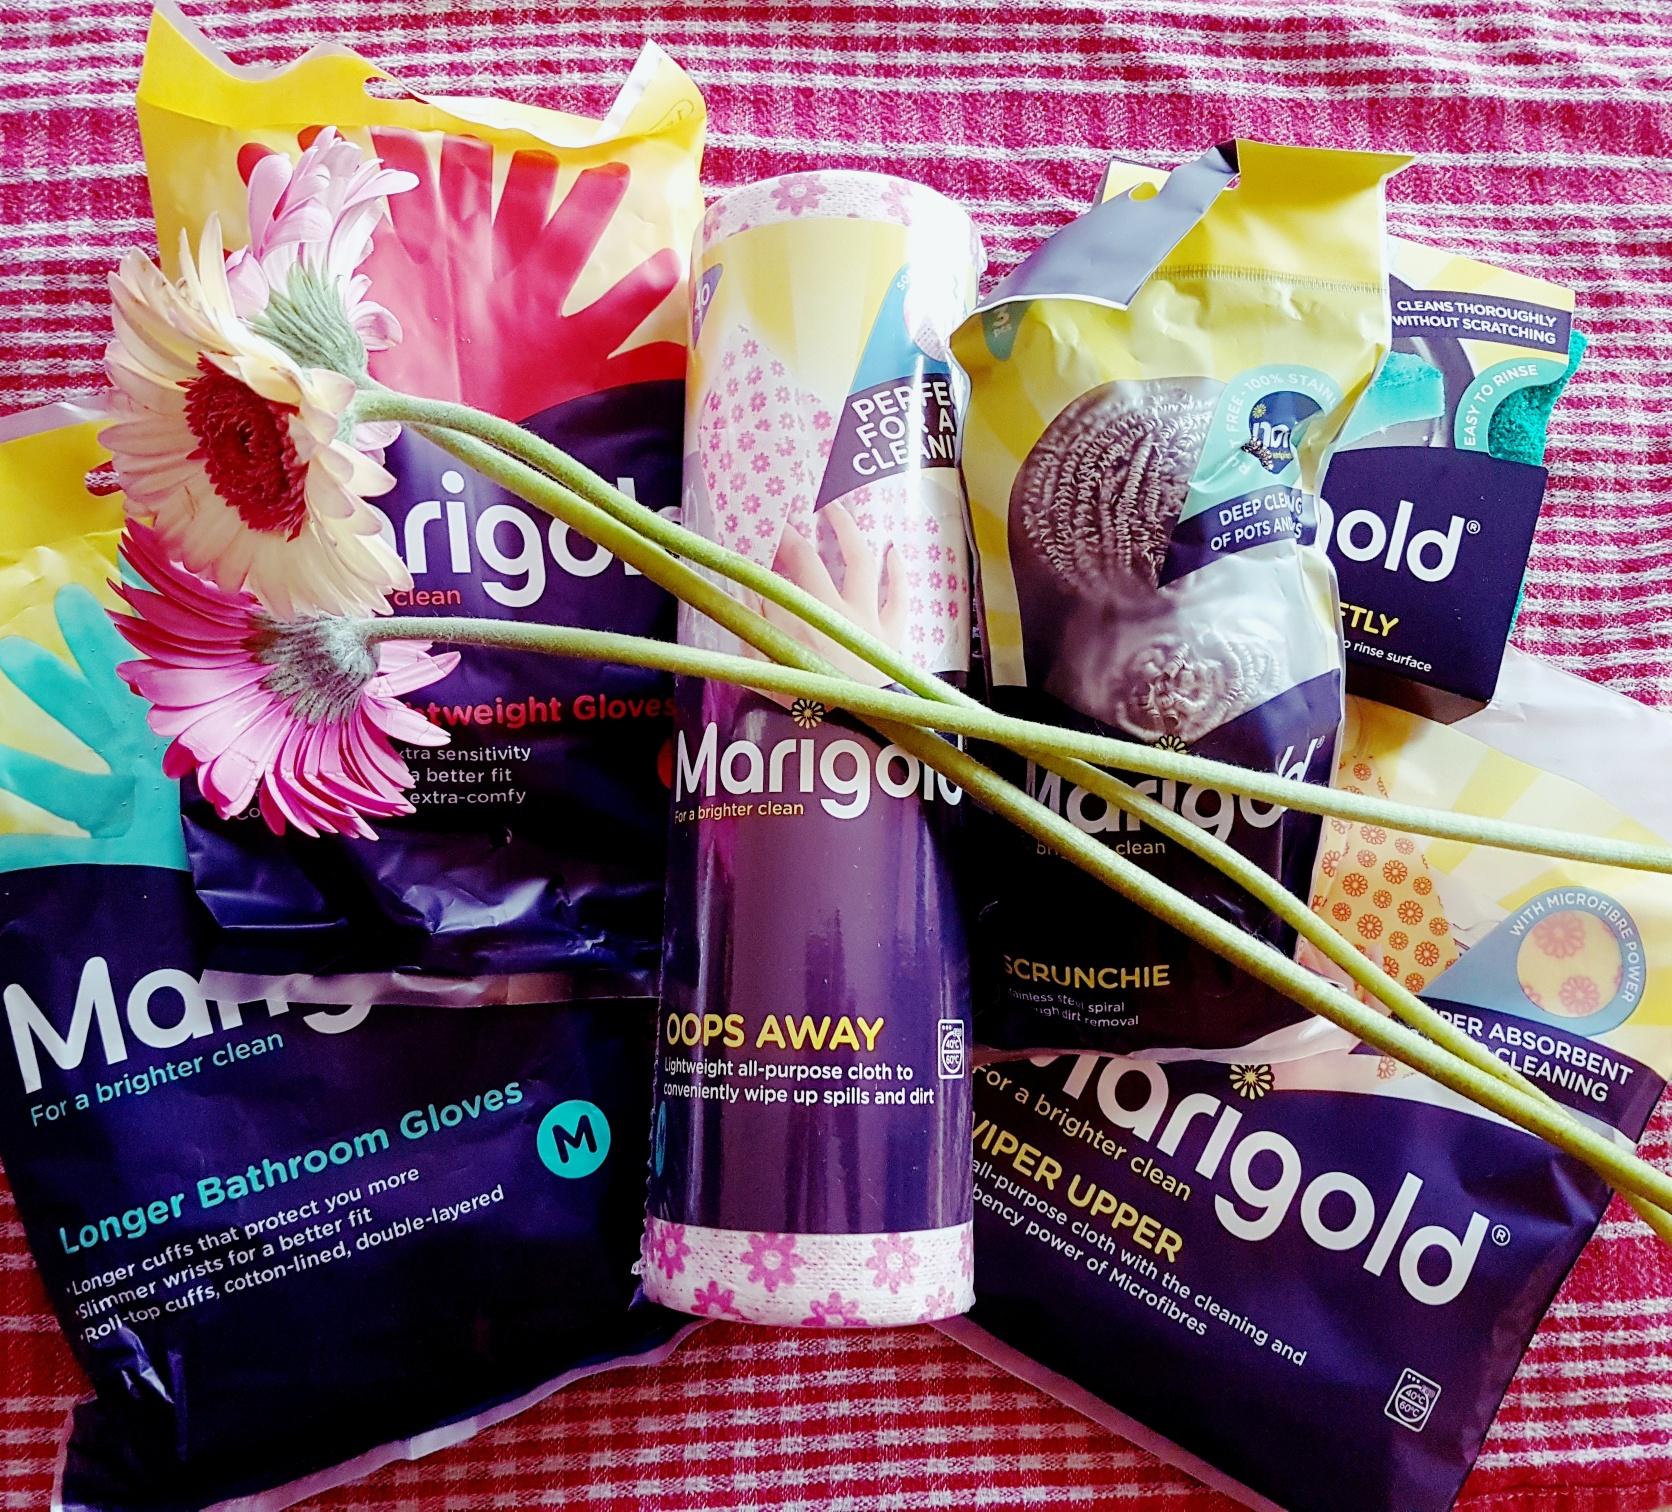 70 years of Marigold